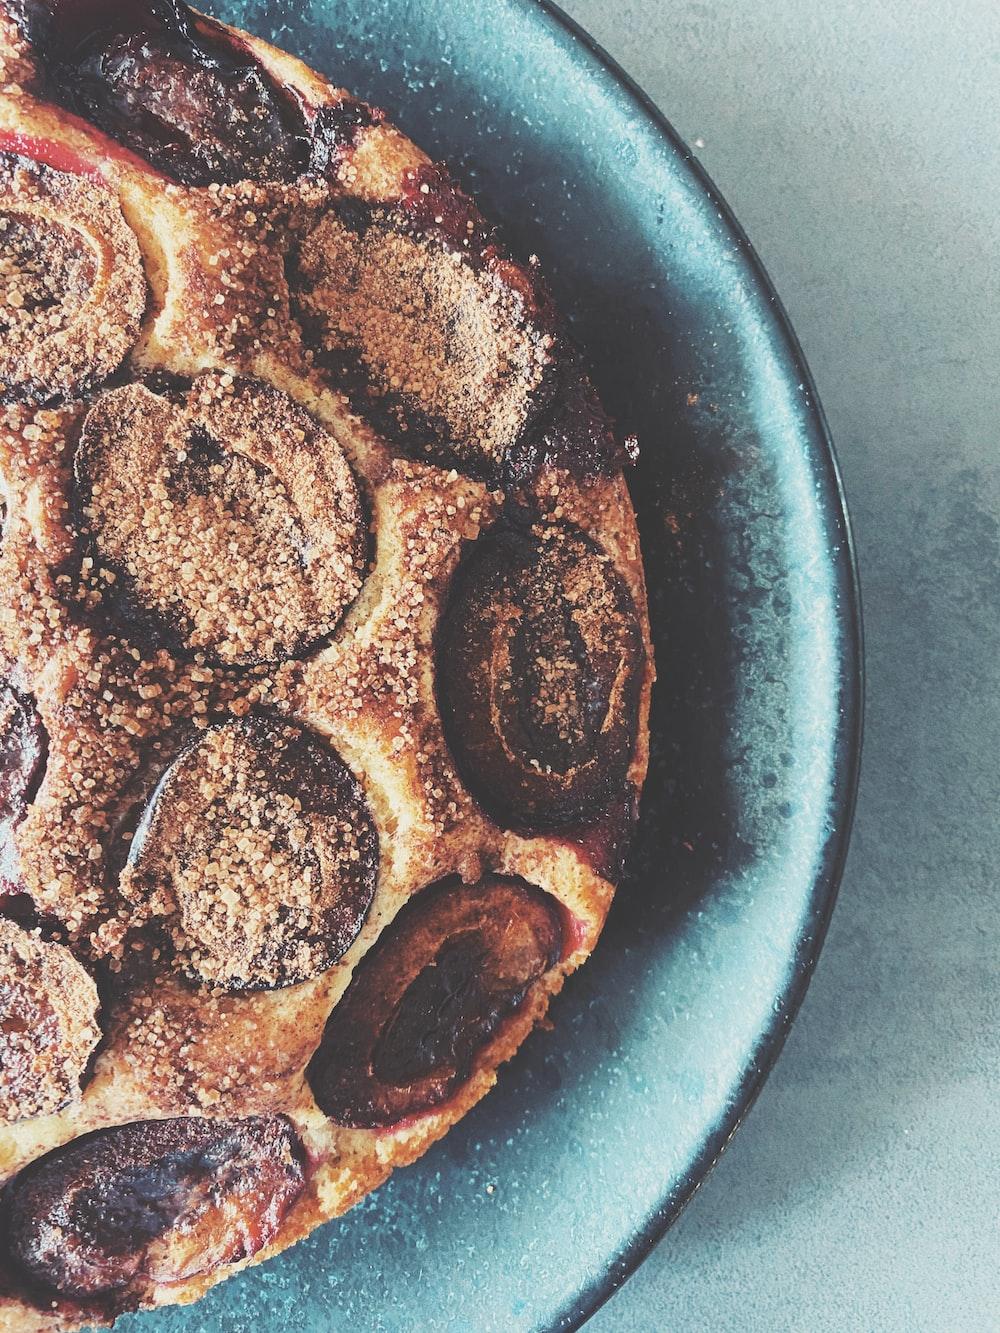 chocolate chip cookies on blue ceramic bowl